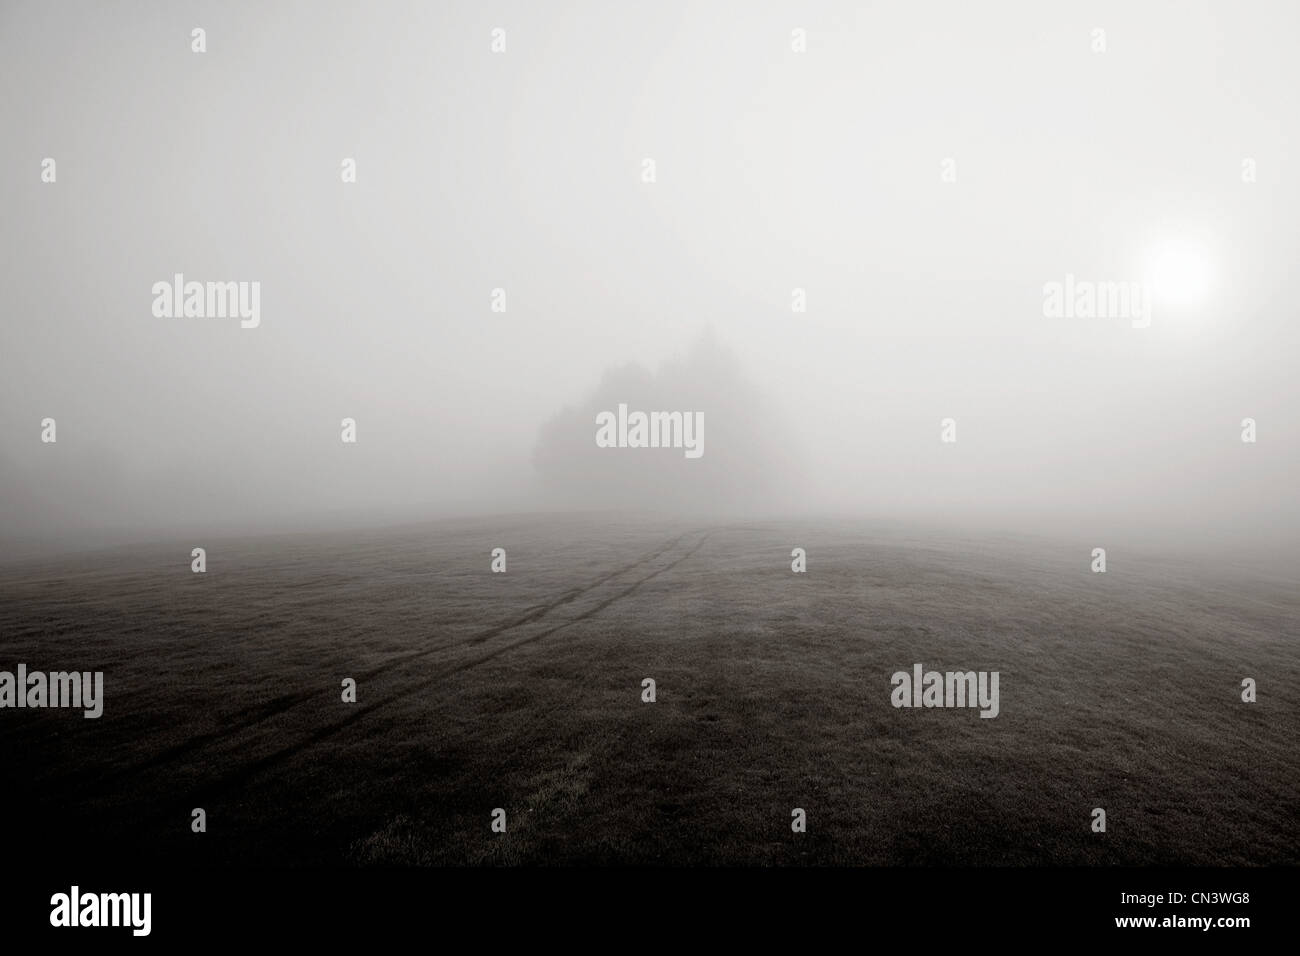 Nebel über Hügel und entfernte Bäume Stockbild